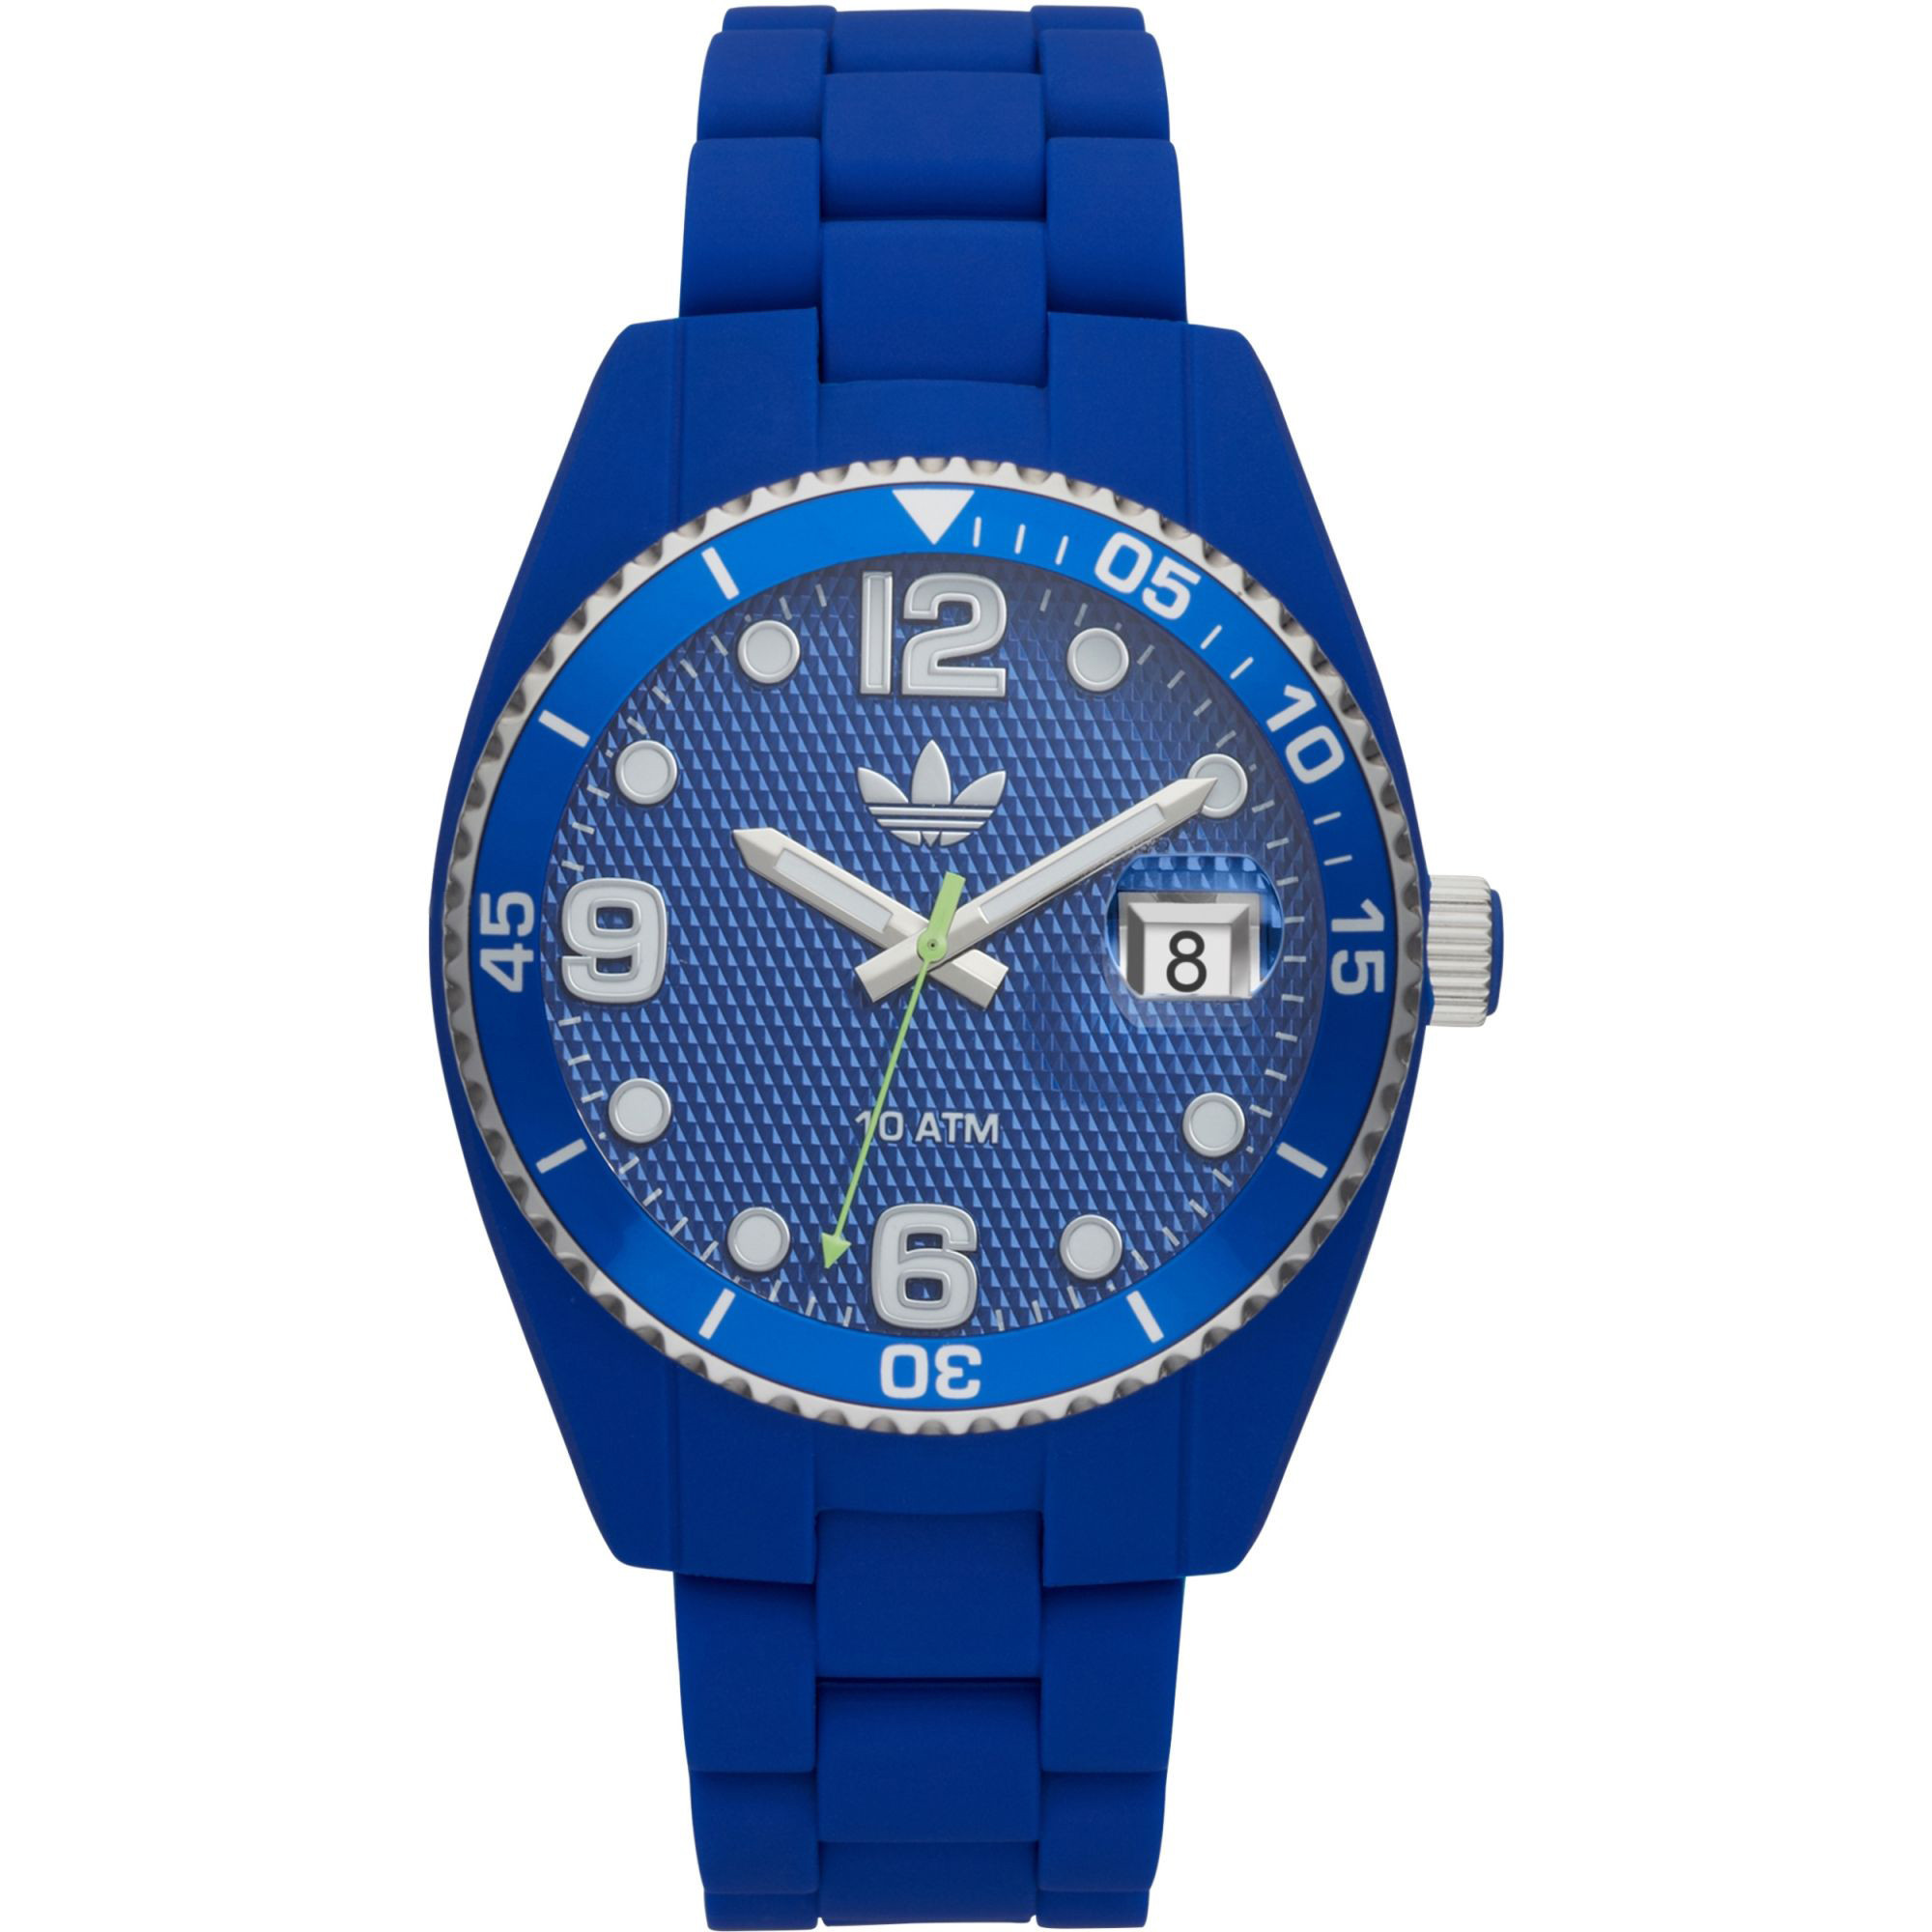 Adidas Brisbane Quartz Blue Dial Men's Analog Watch ADH6161 by